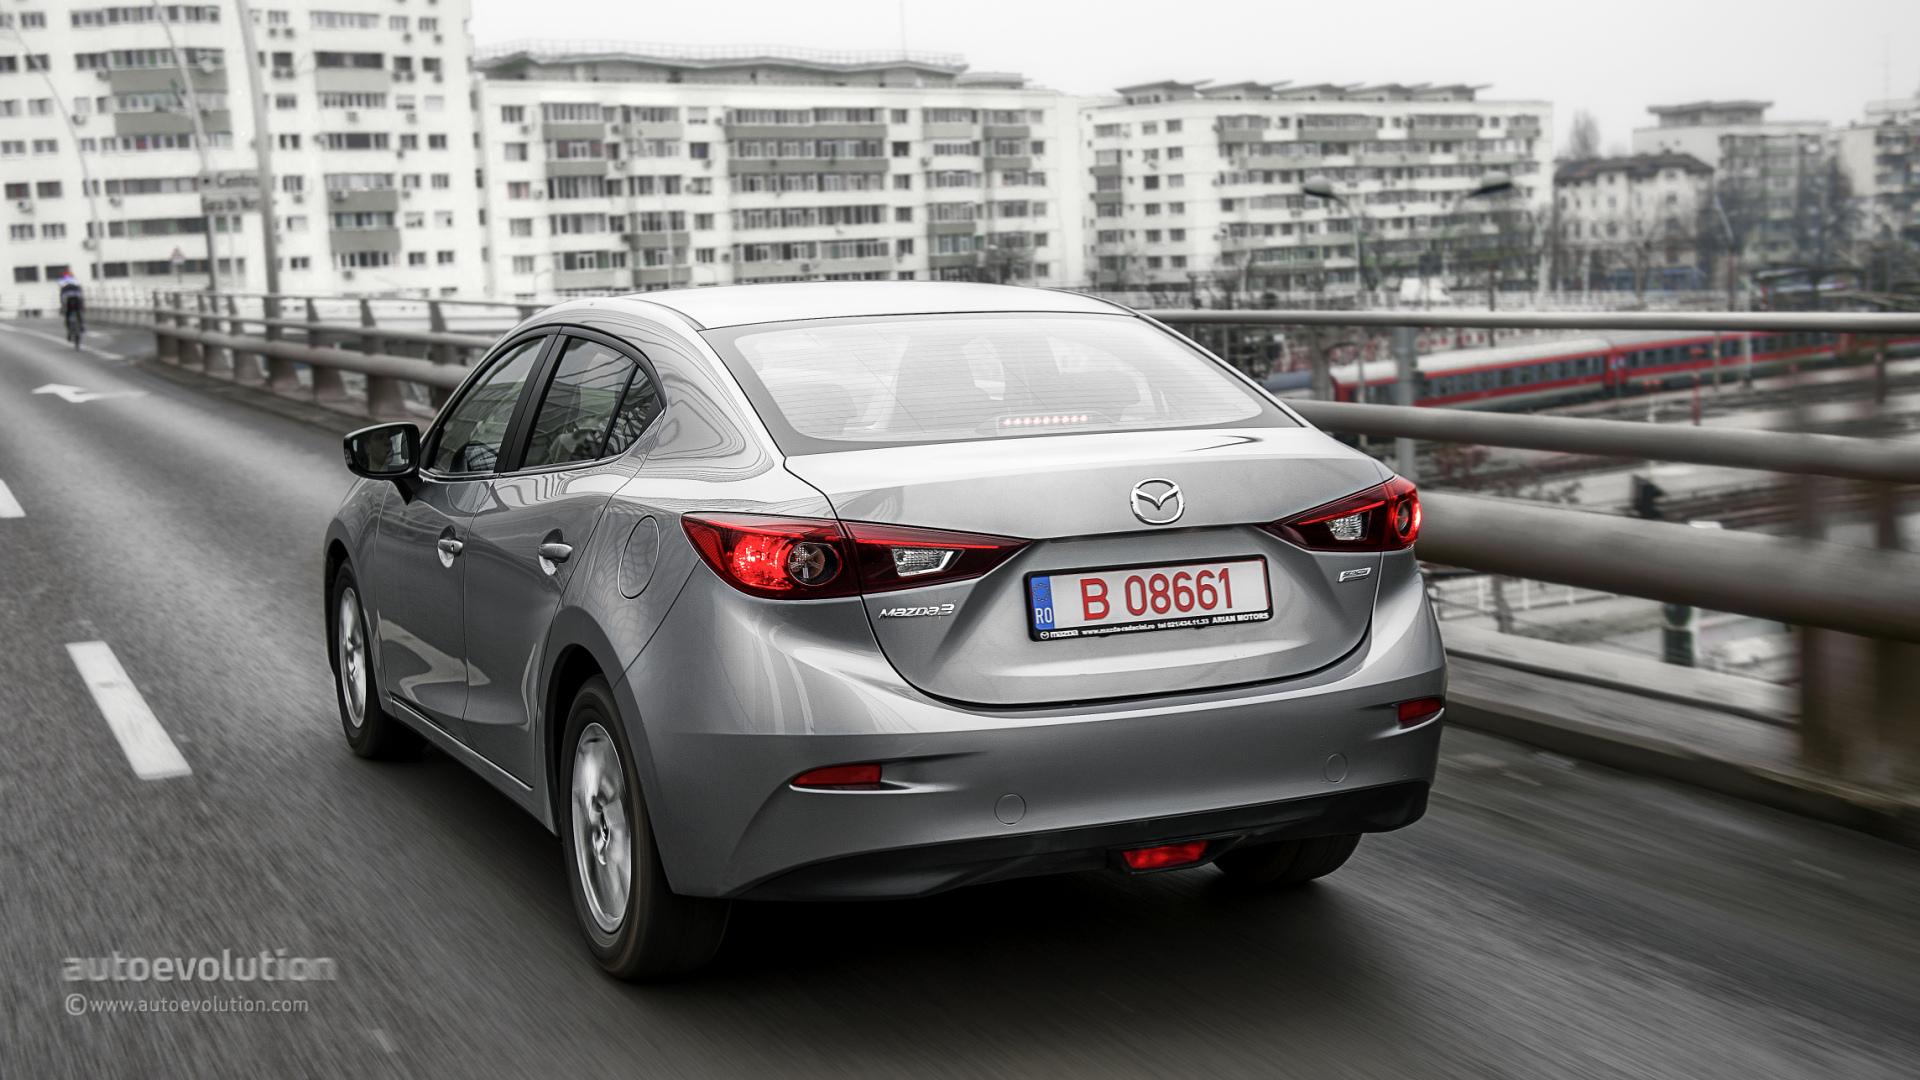 https://s1.cdn.autoevolution.com/images/news/2014-mazda3-sedan-original-pictures-78284_1.jpg